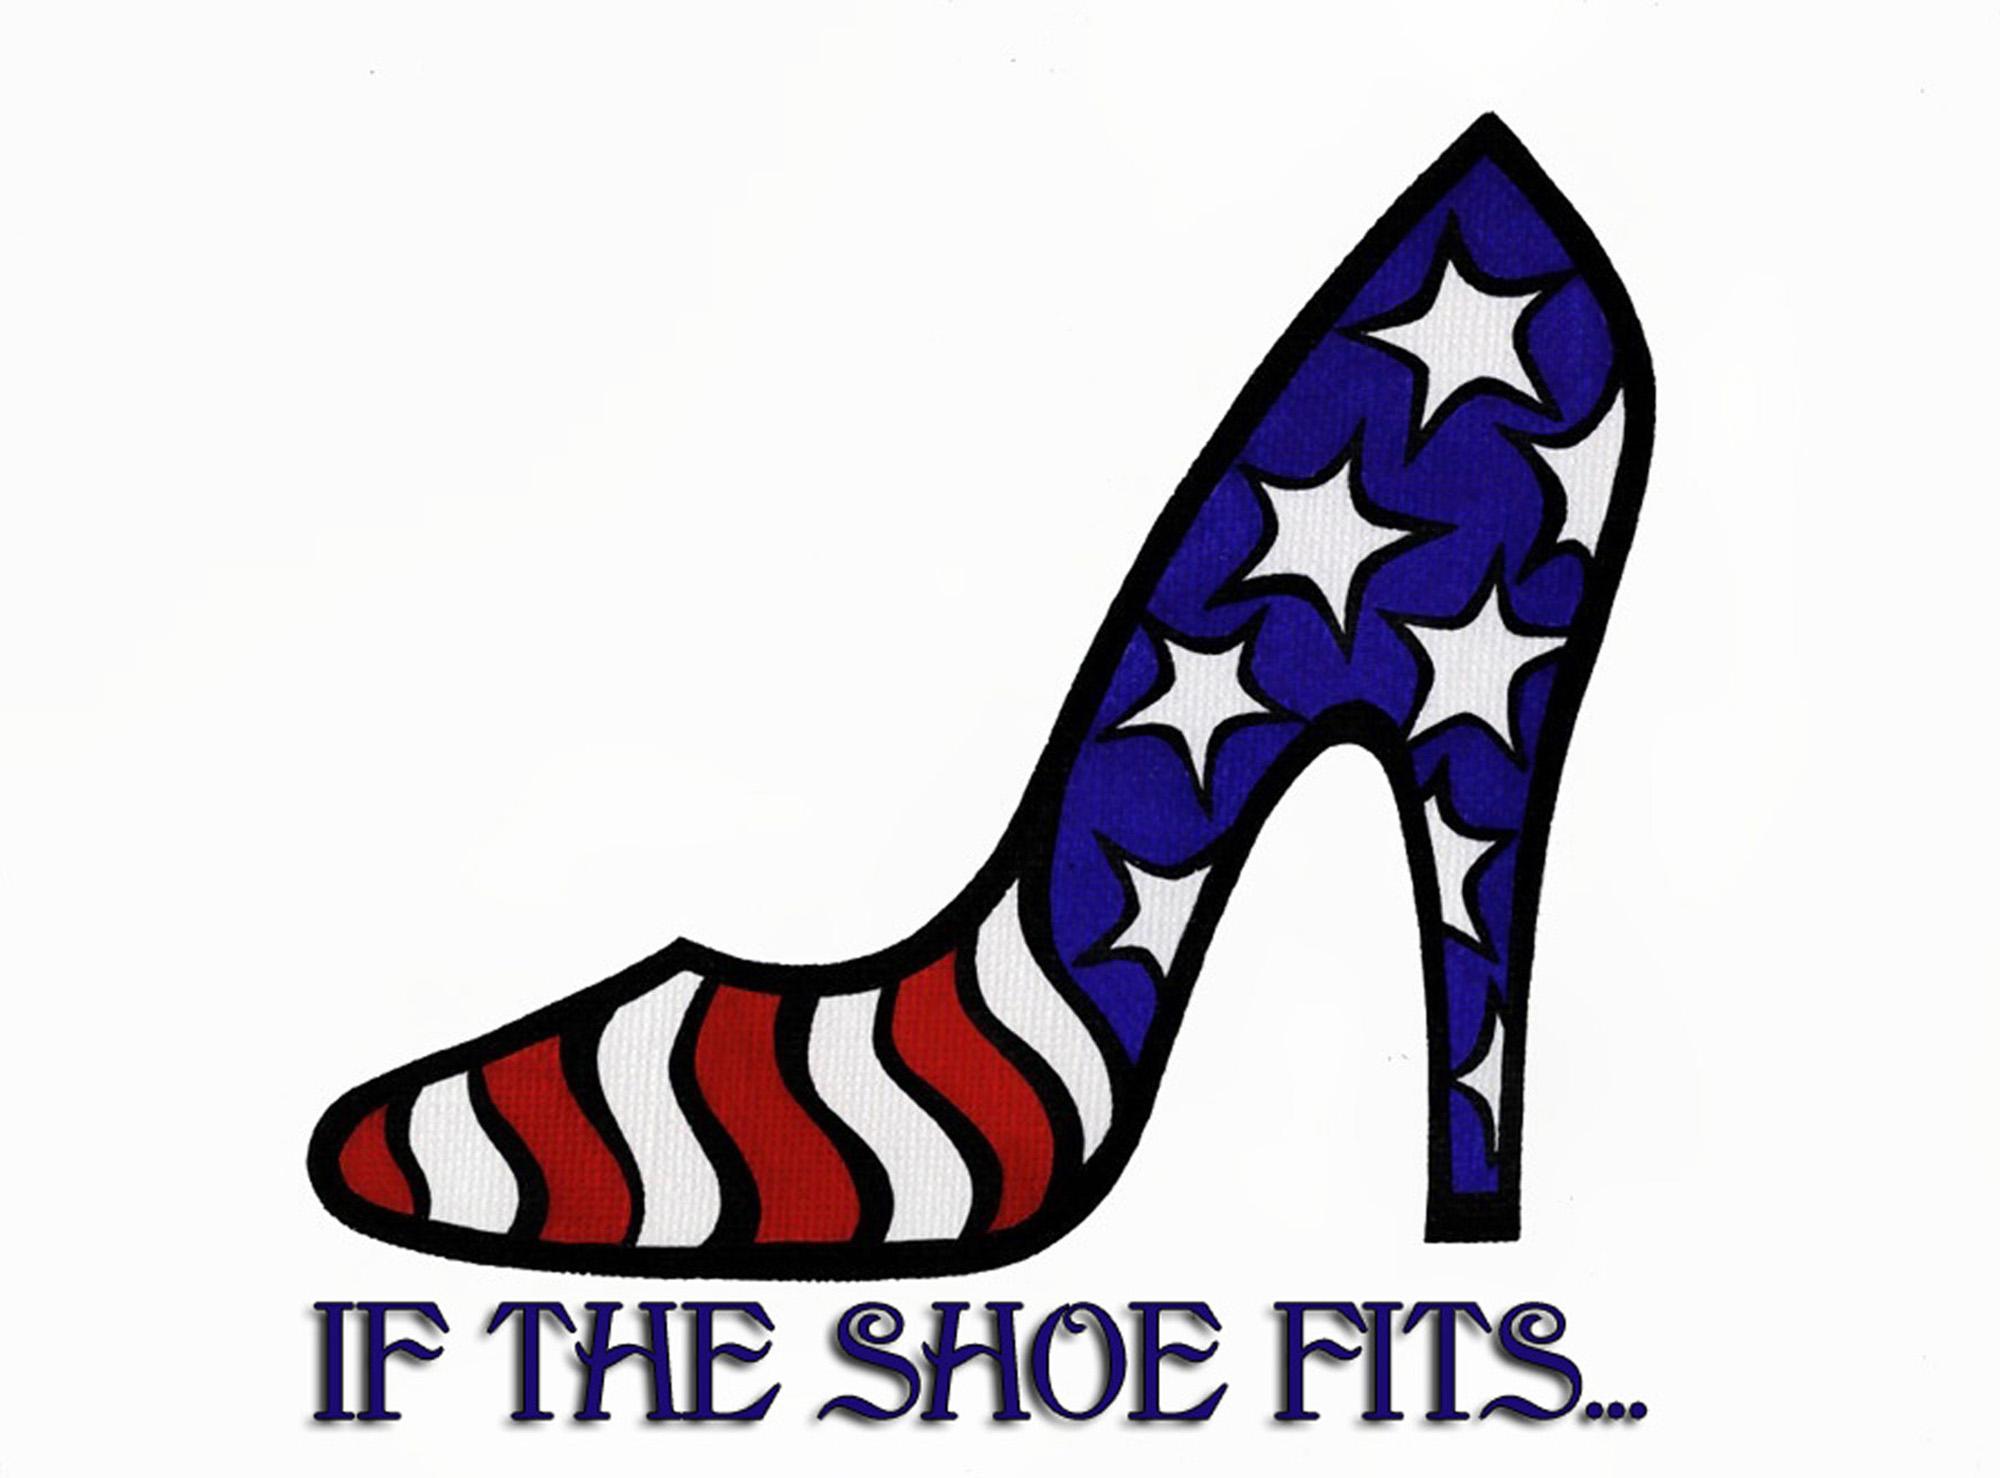 shoe fits wear If the shoe fits